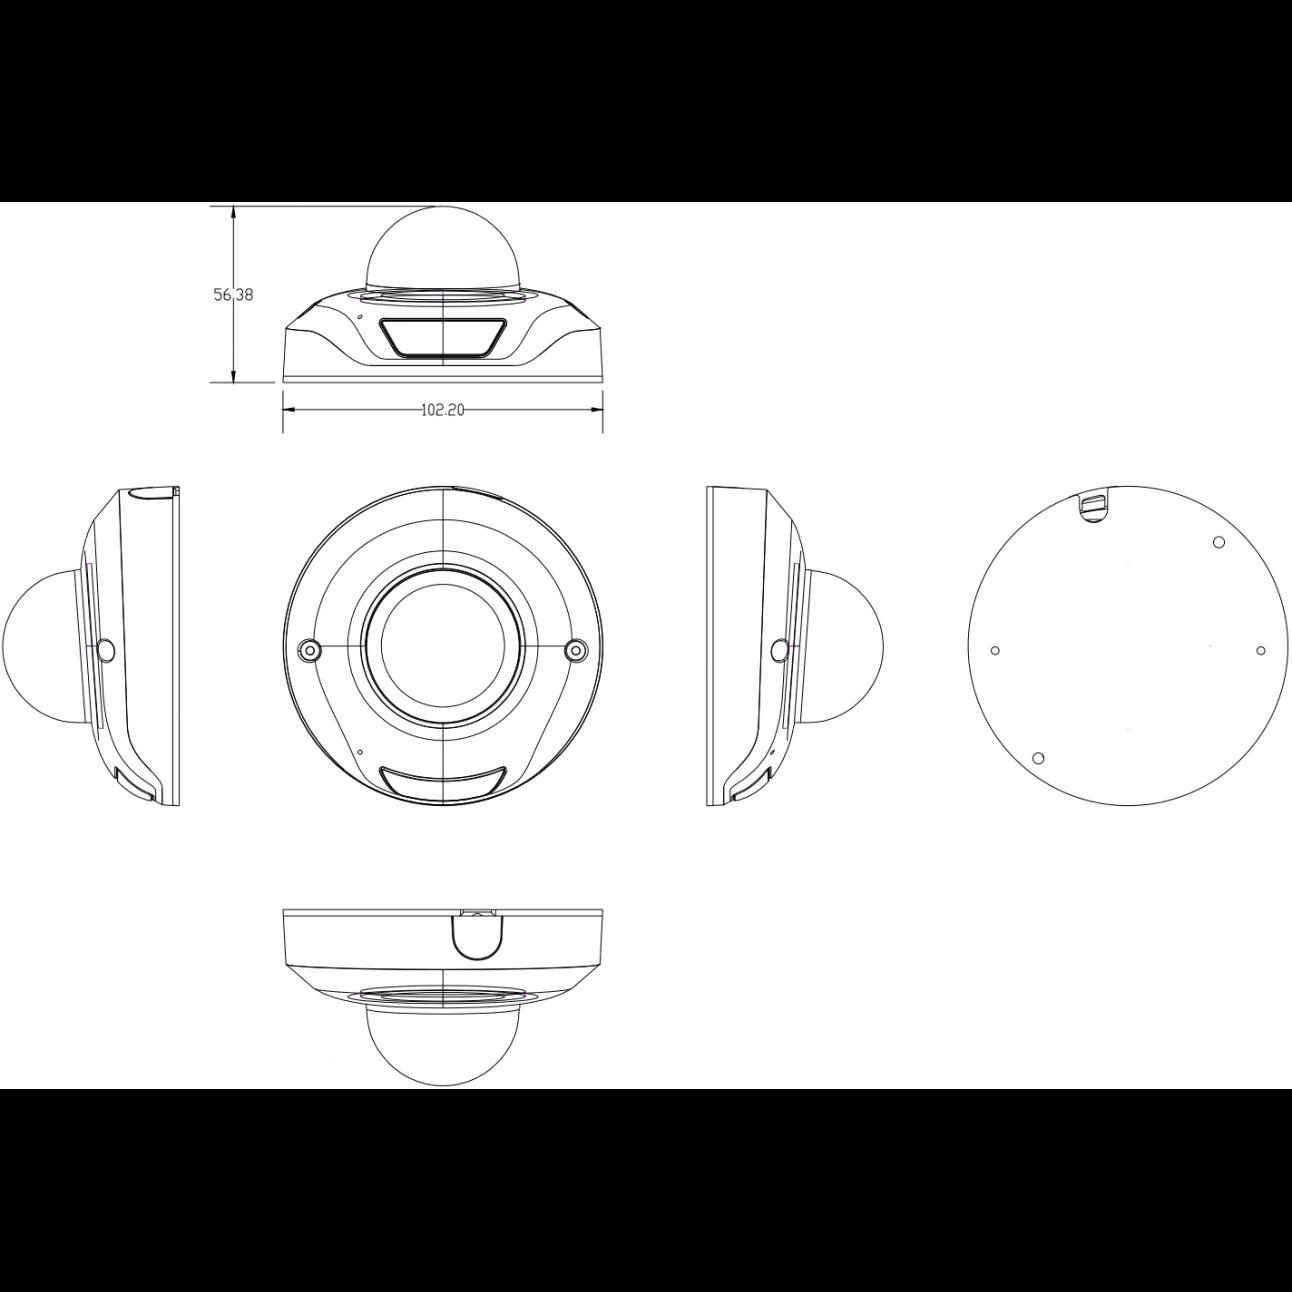 IP камера видеонаблюдения  OMNY серия BASE miniDome4A купольная 4.0Мп, 1.7 мм, PoE, 12 В, ИК, встр. микр. (уценка)